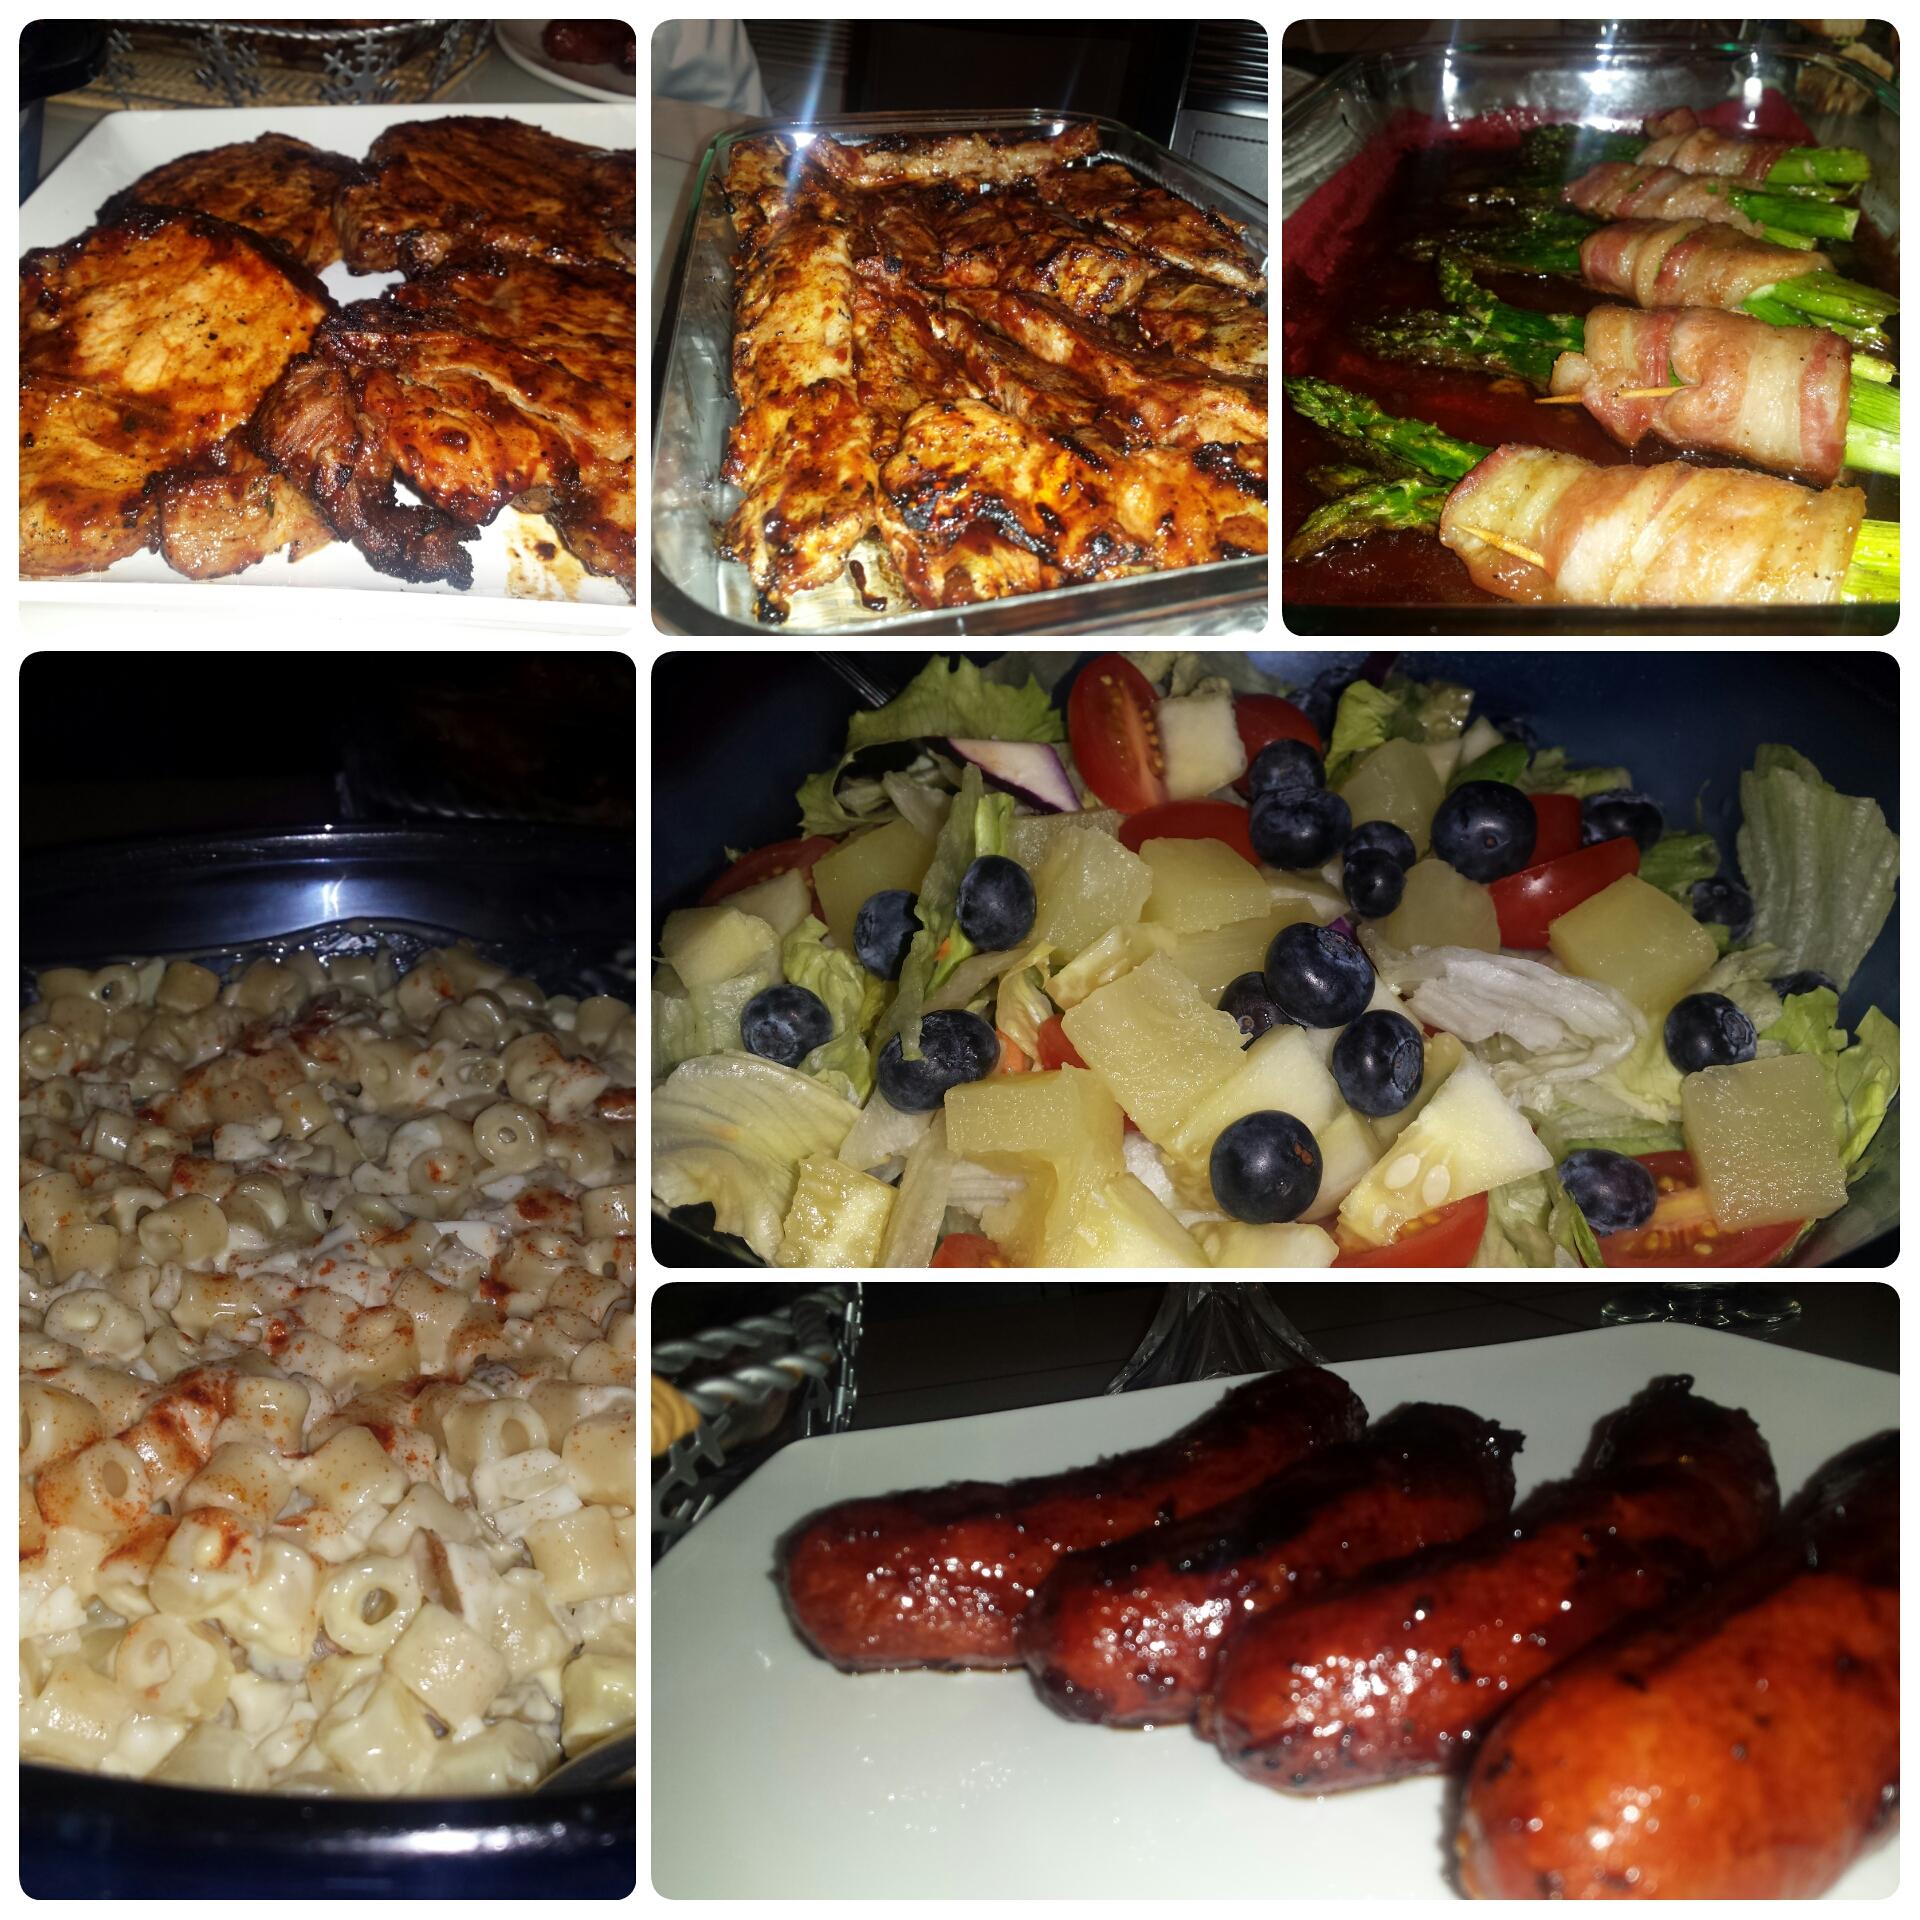 barbecue pork chops, brown sugar bacon wrapped asparagus, pork riblets, macaroni salad, hotlinks, salad